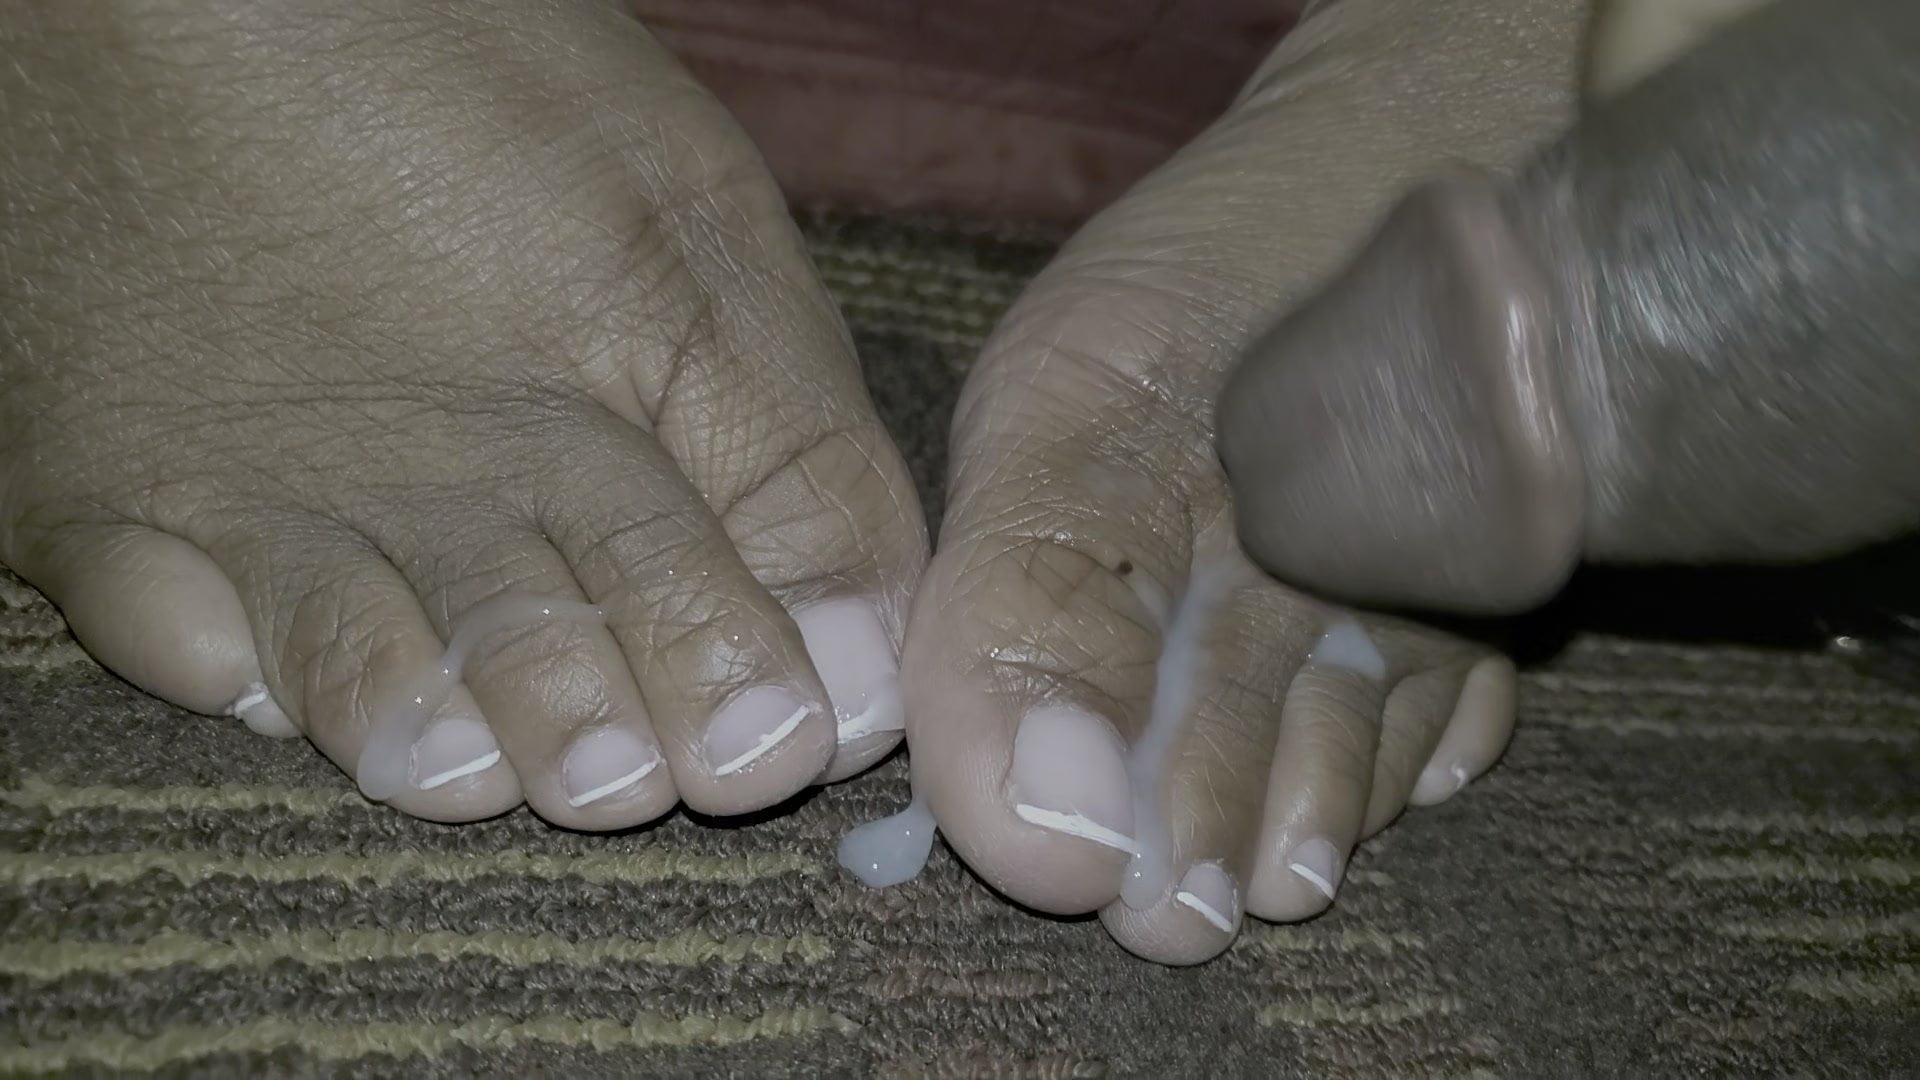 French Girls Feet Socks